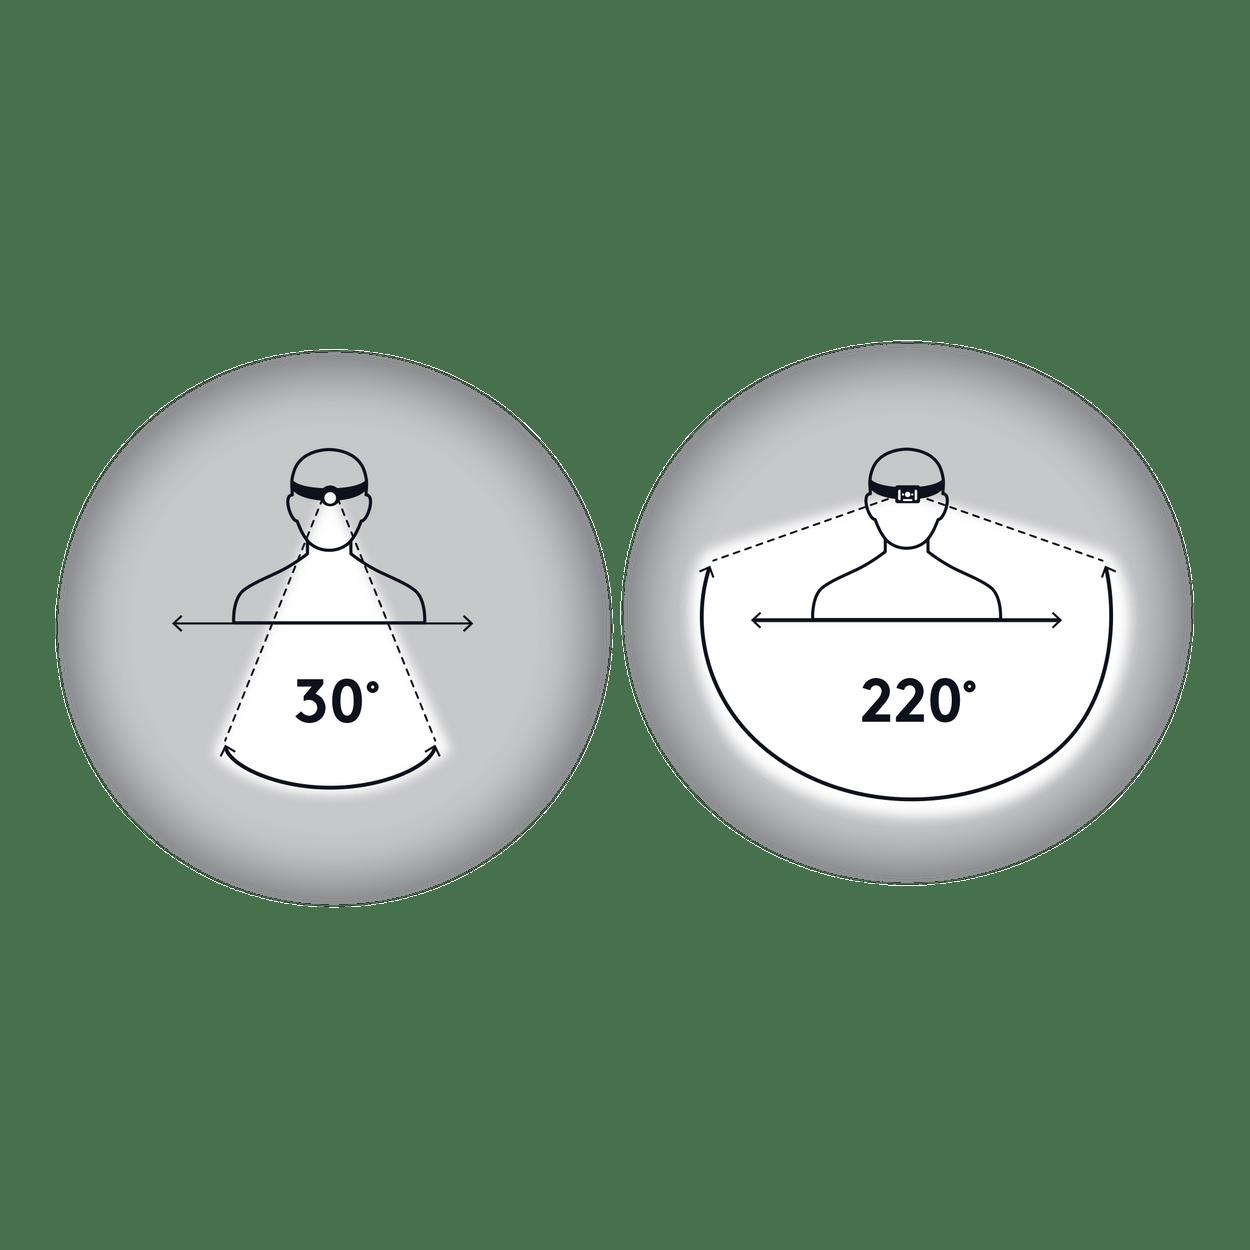 30 degree to 220 illustration of light